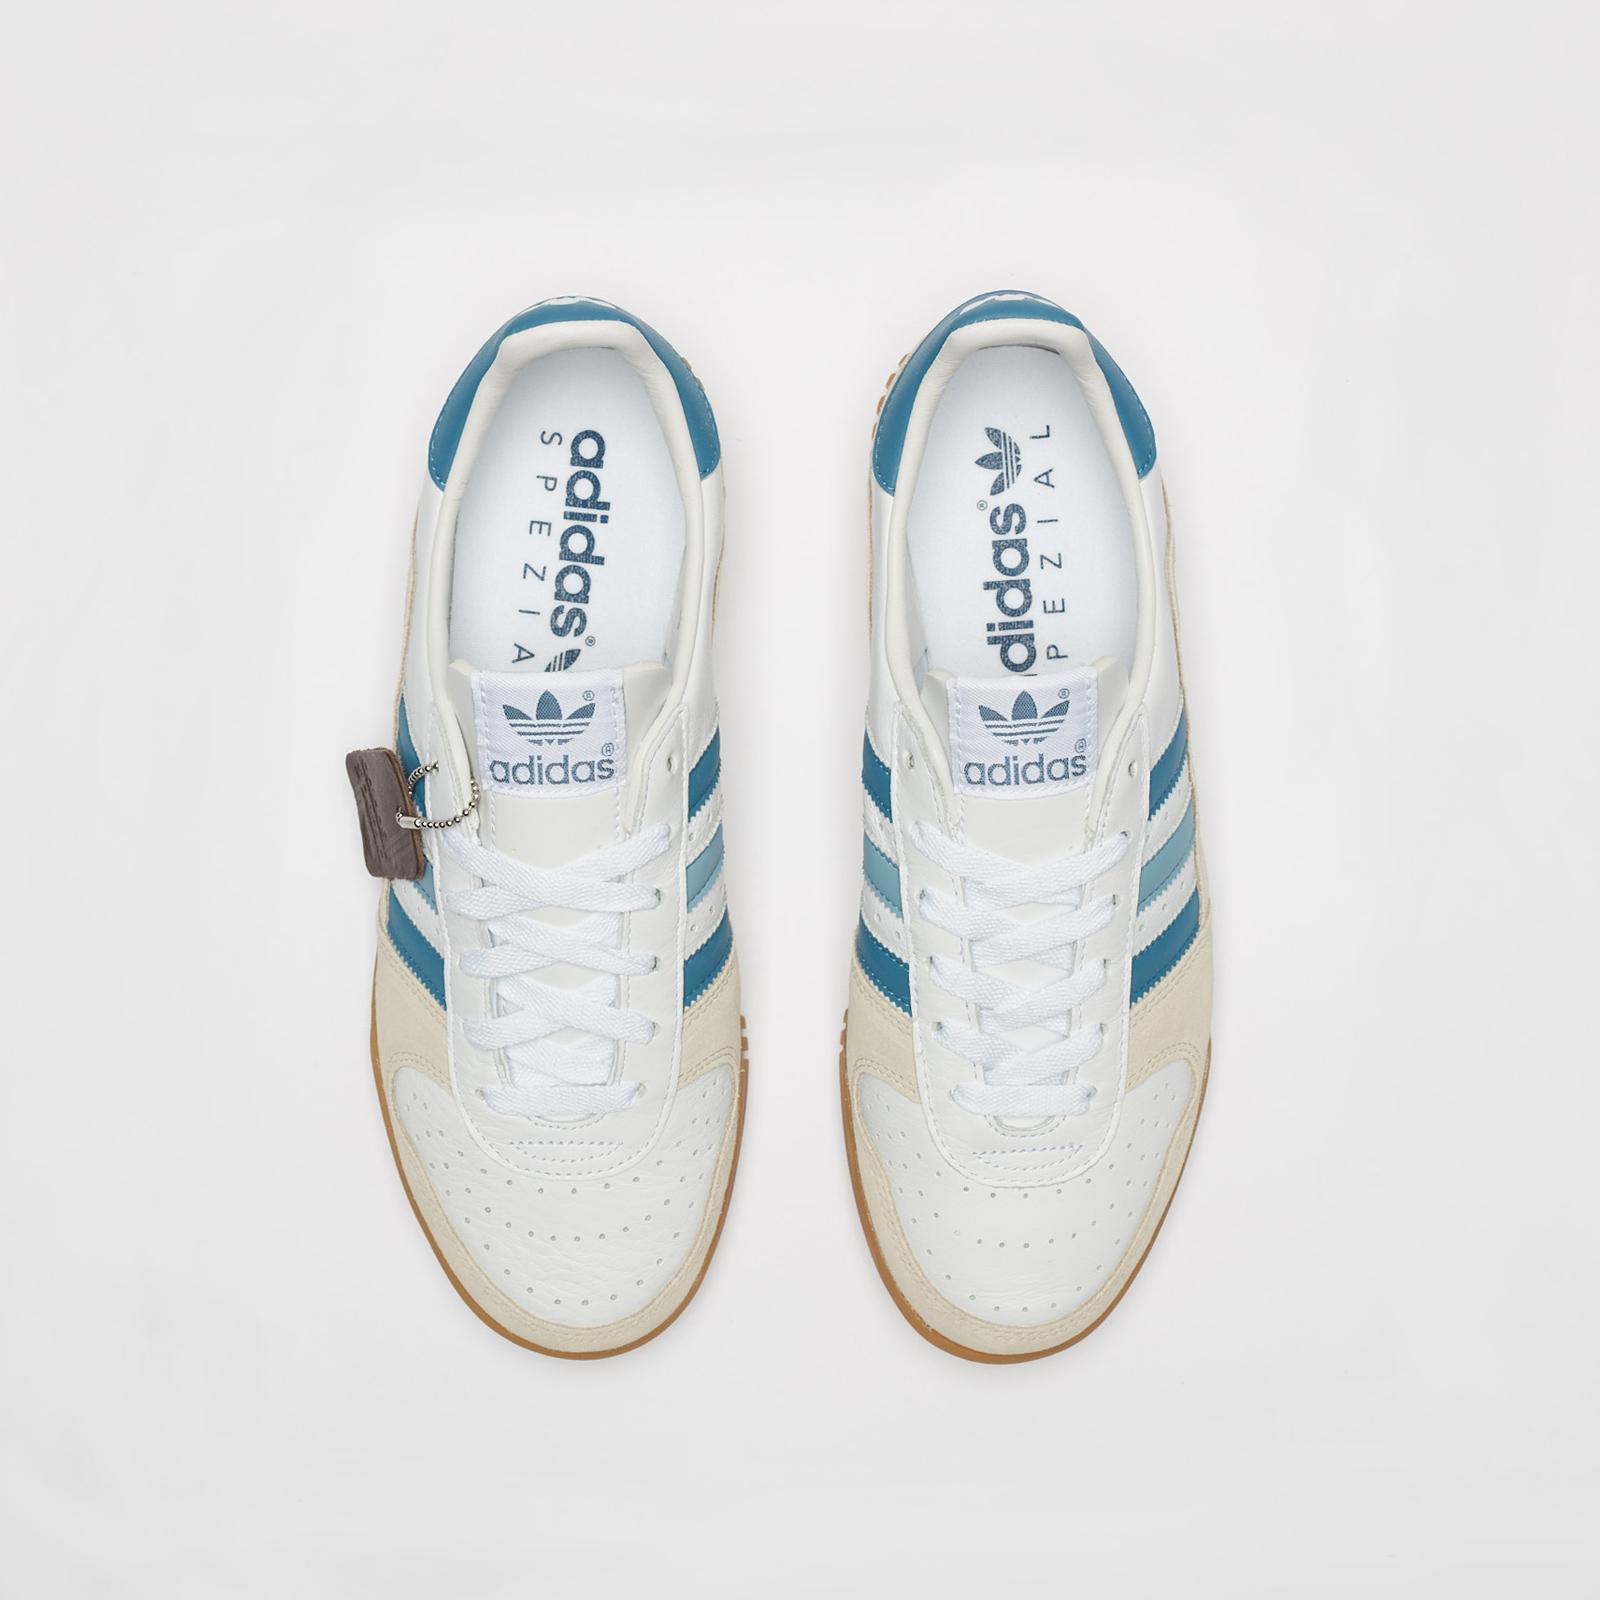 sports shoes c86ea b5c8c ... adidas Originals Spezial Indoor Comp